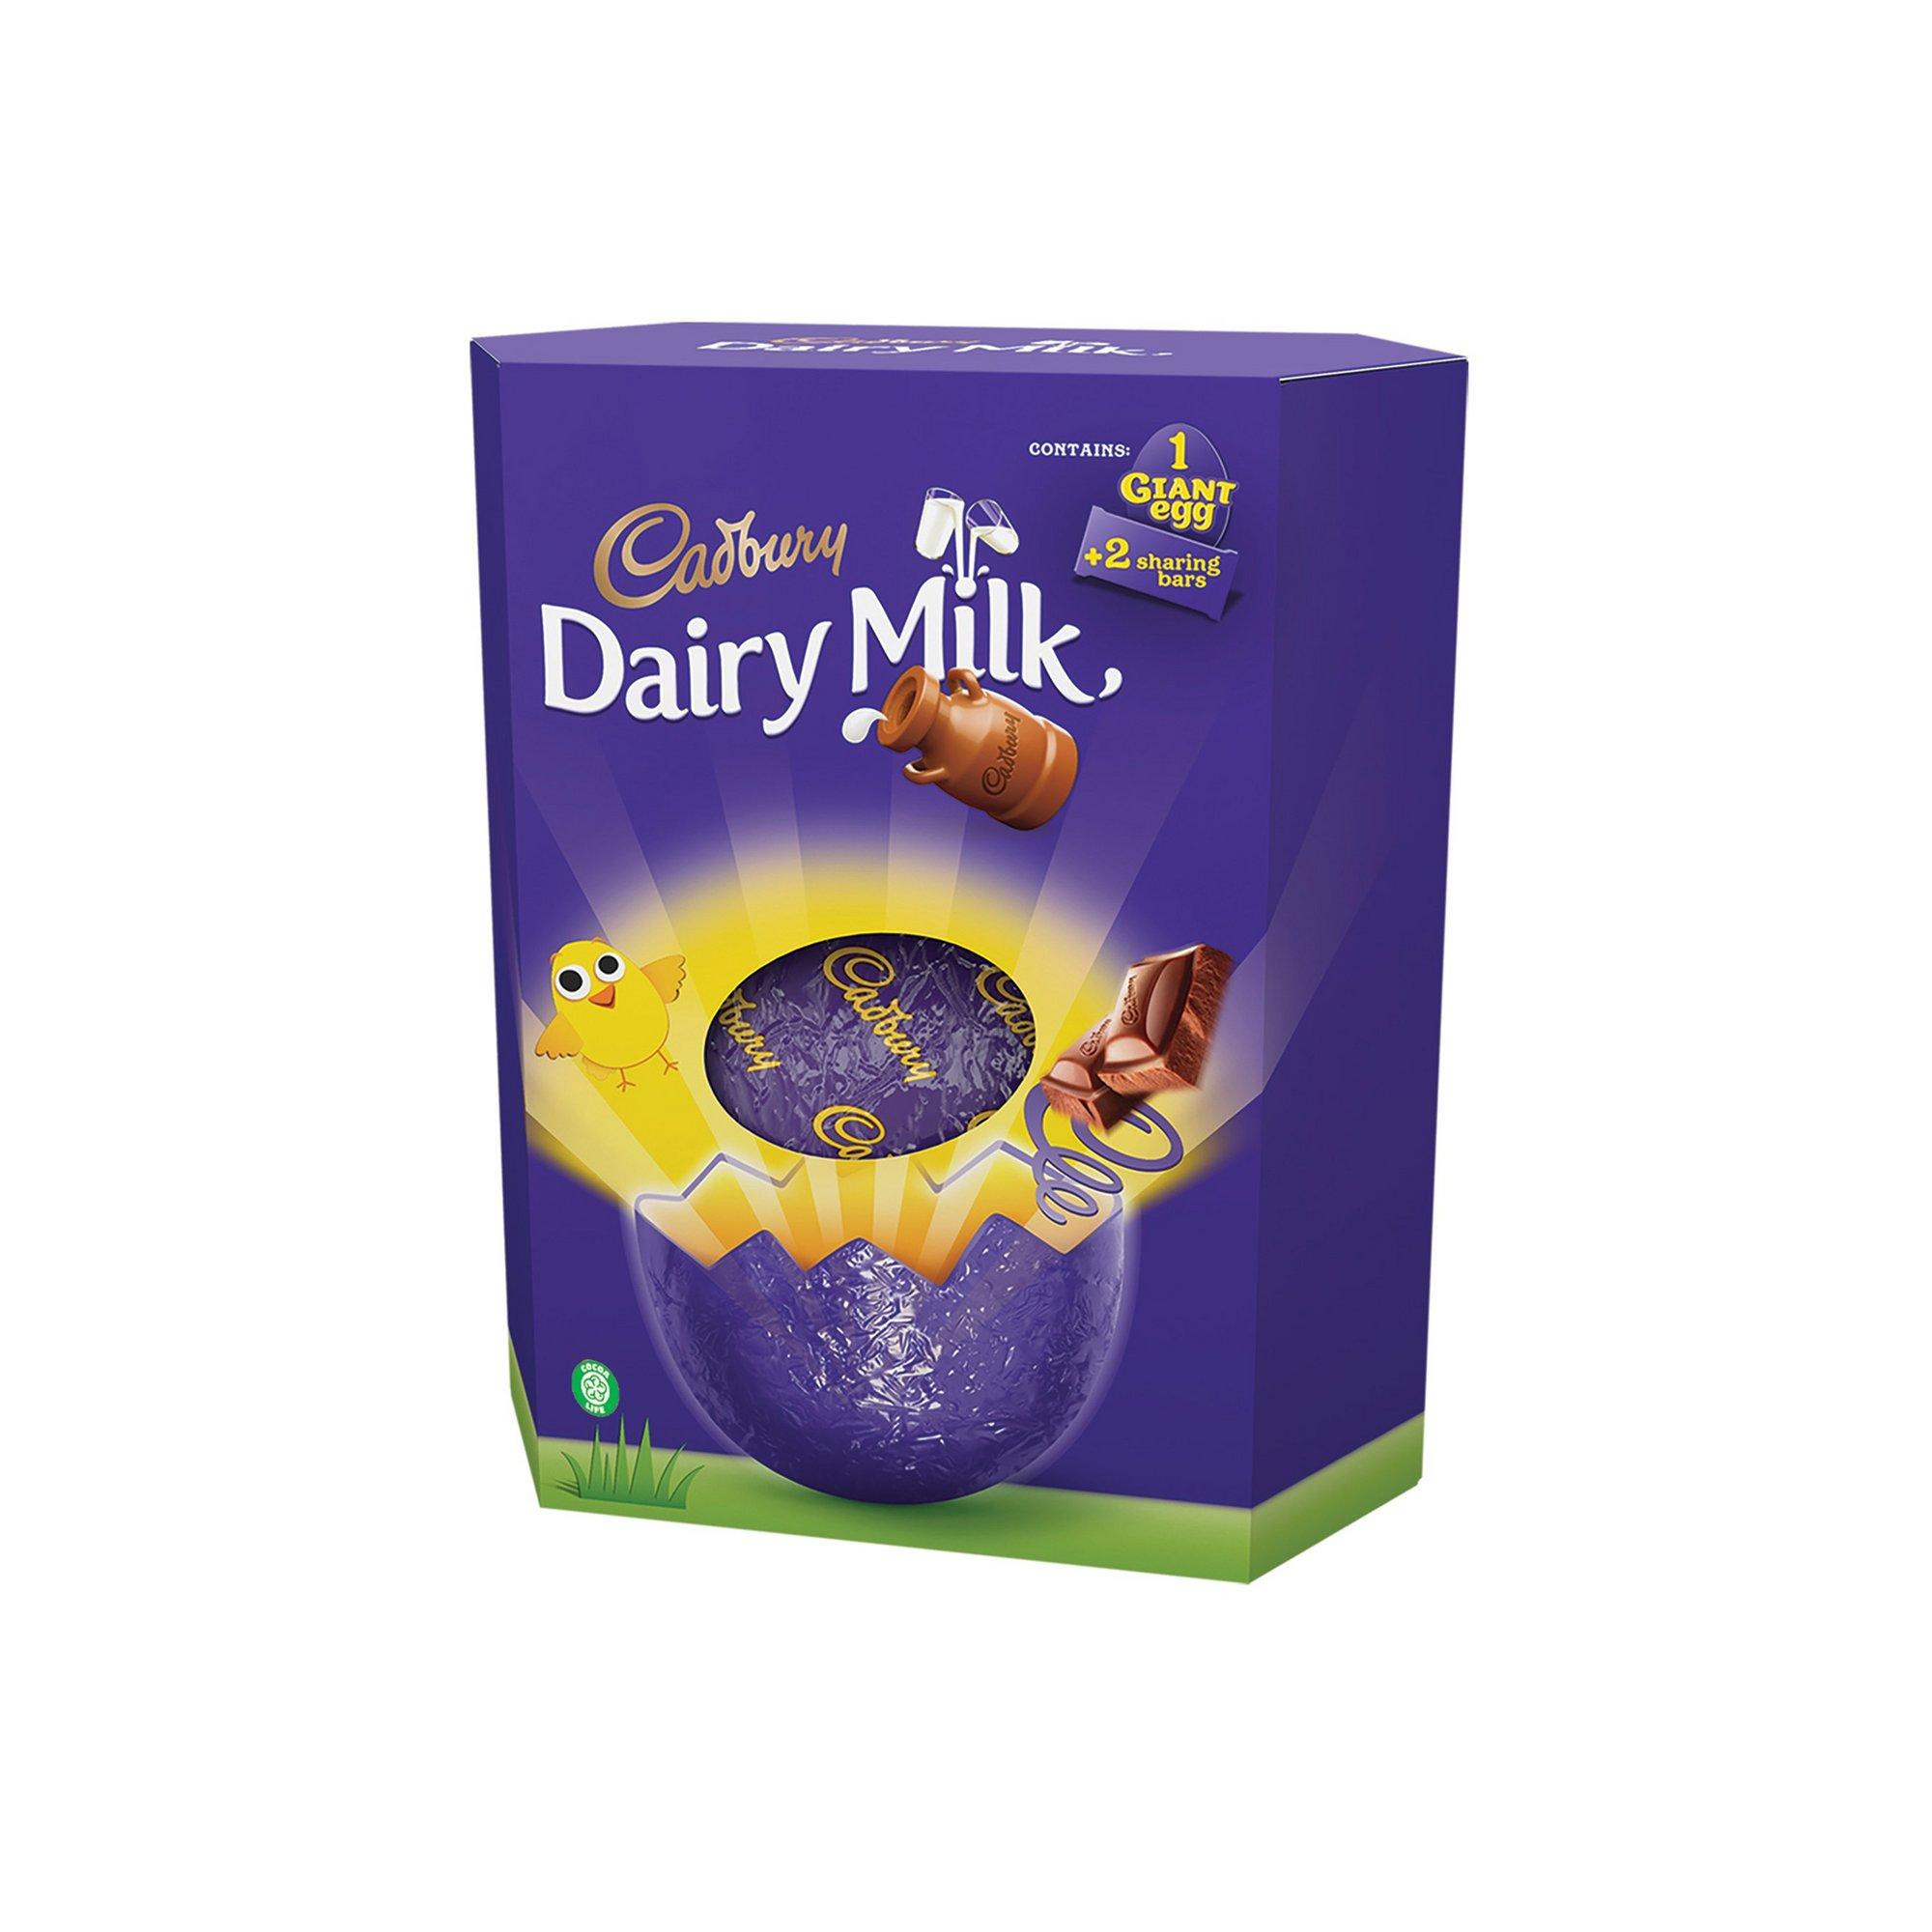 Image of Cadbury Dairy Milk Giant Egg